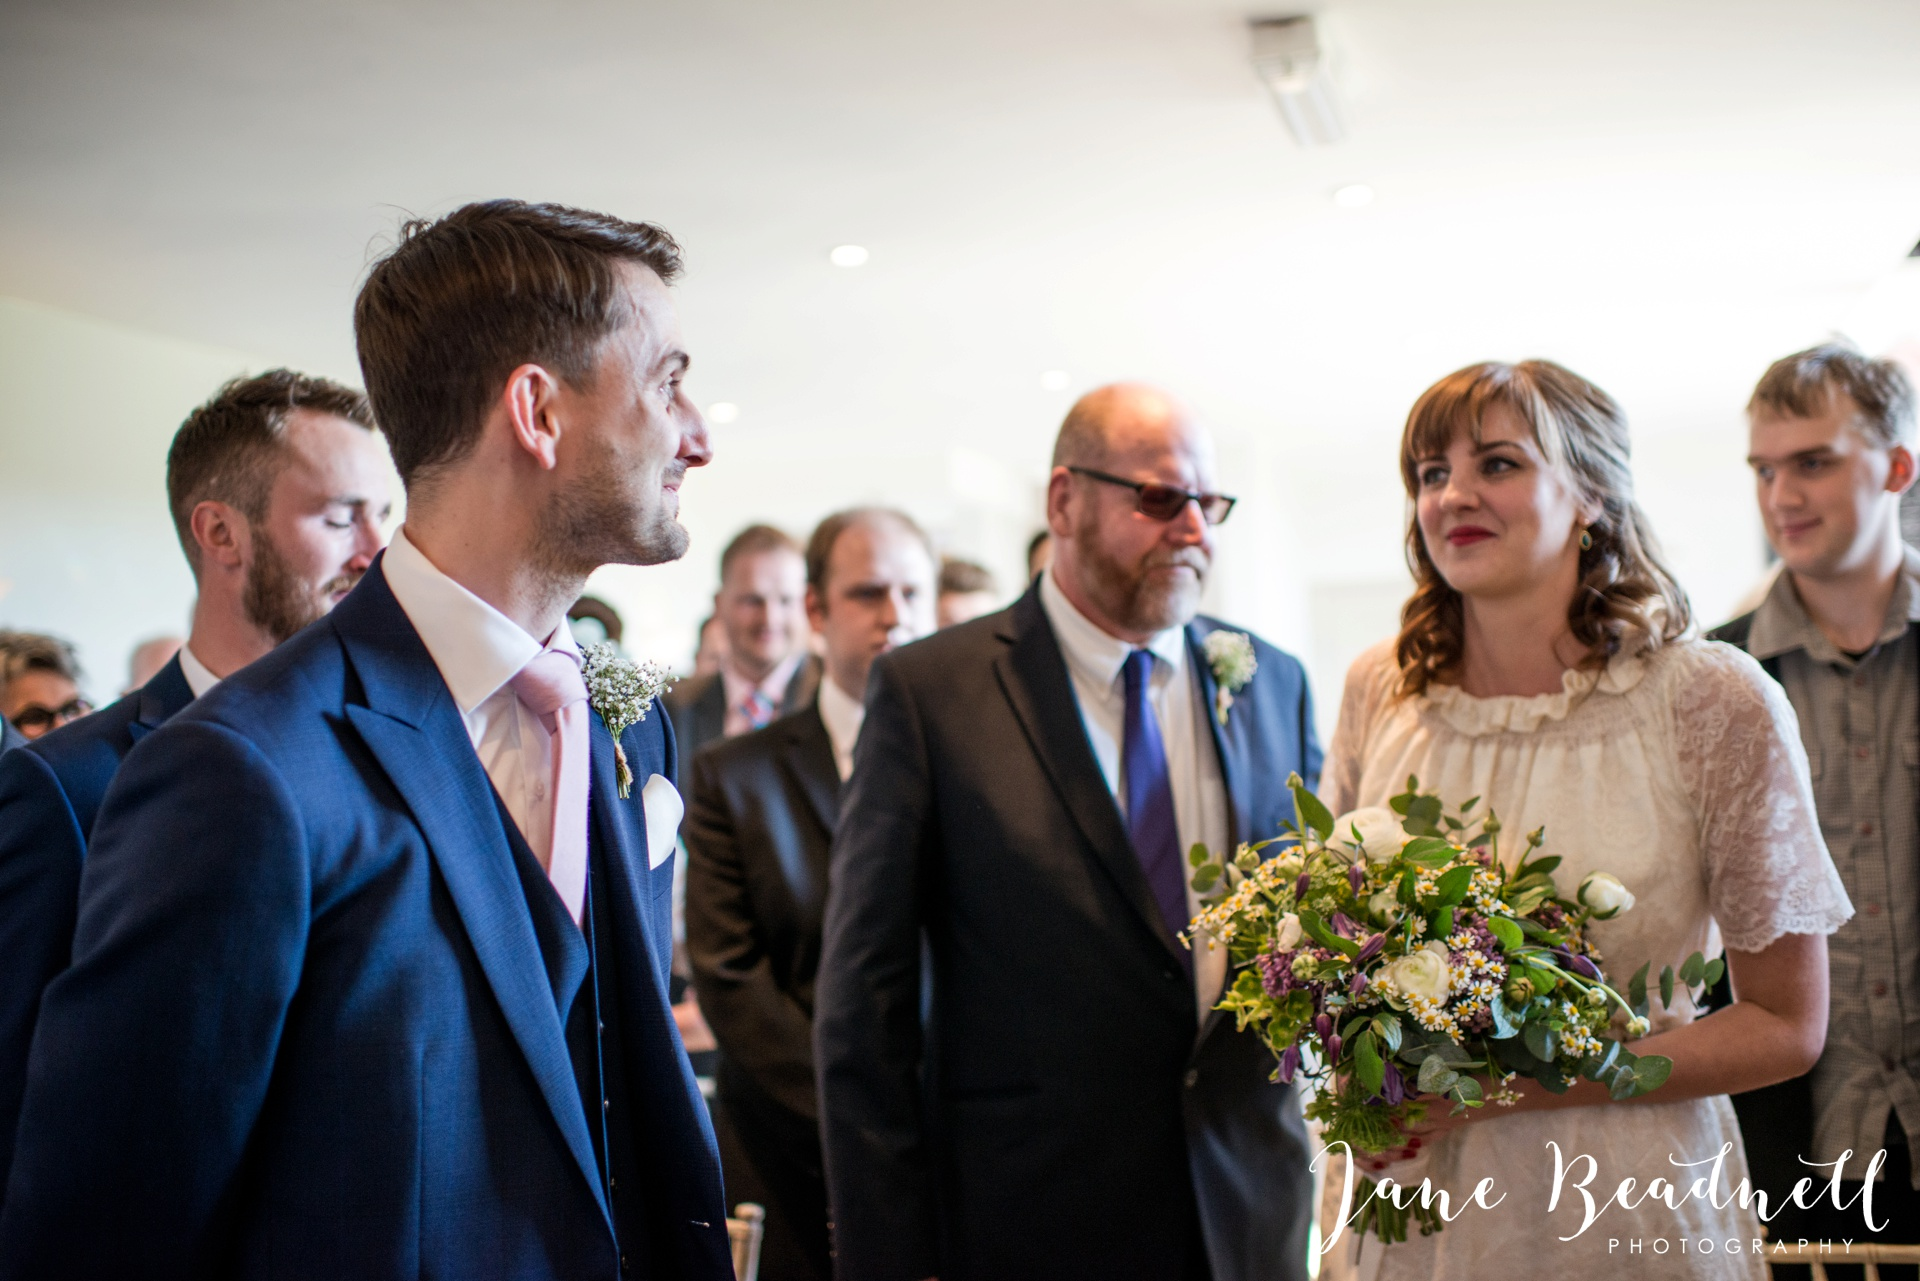 Jane Beadnell fine art wedding photographer The Cheerful Chilli Barn Otley_0015